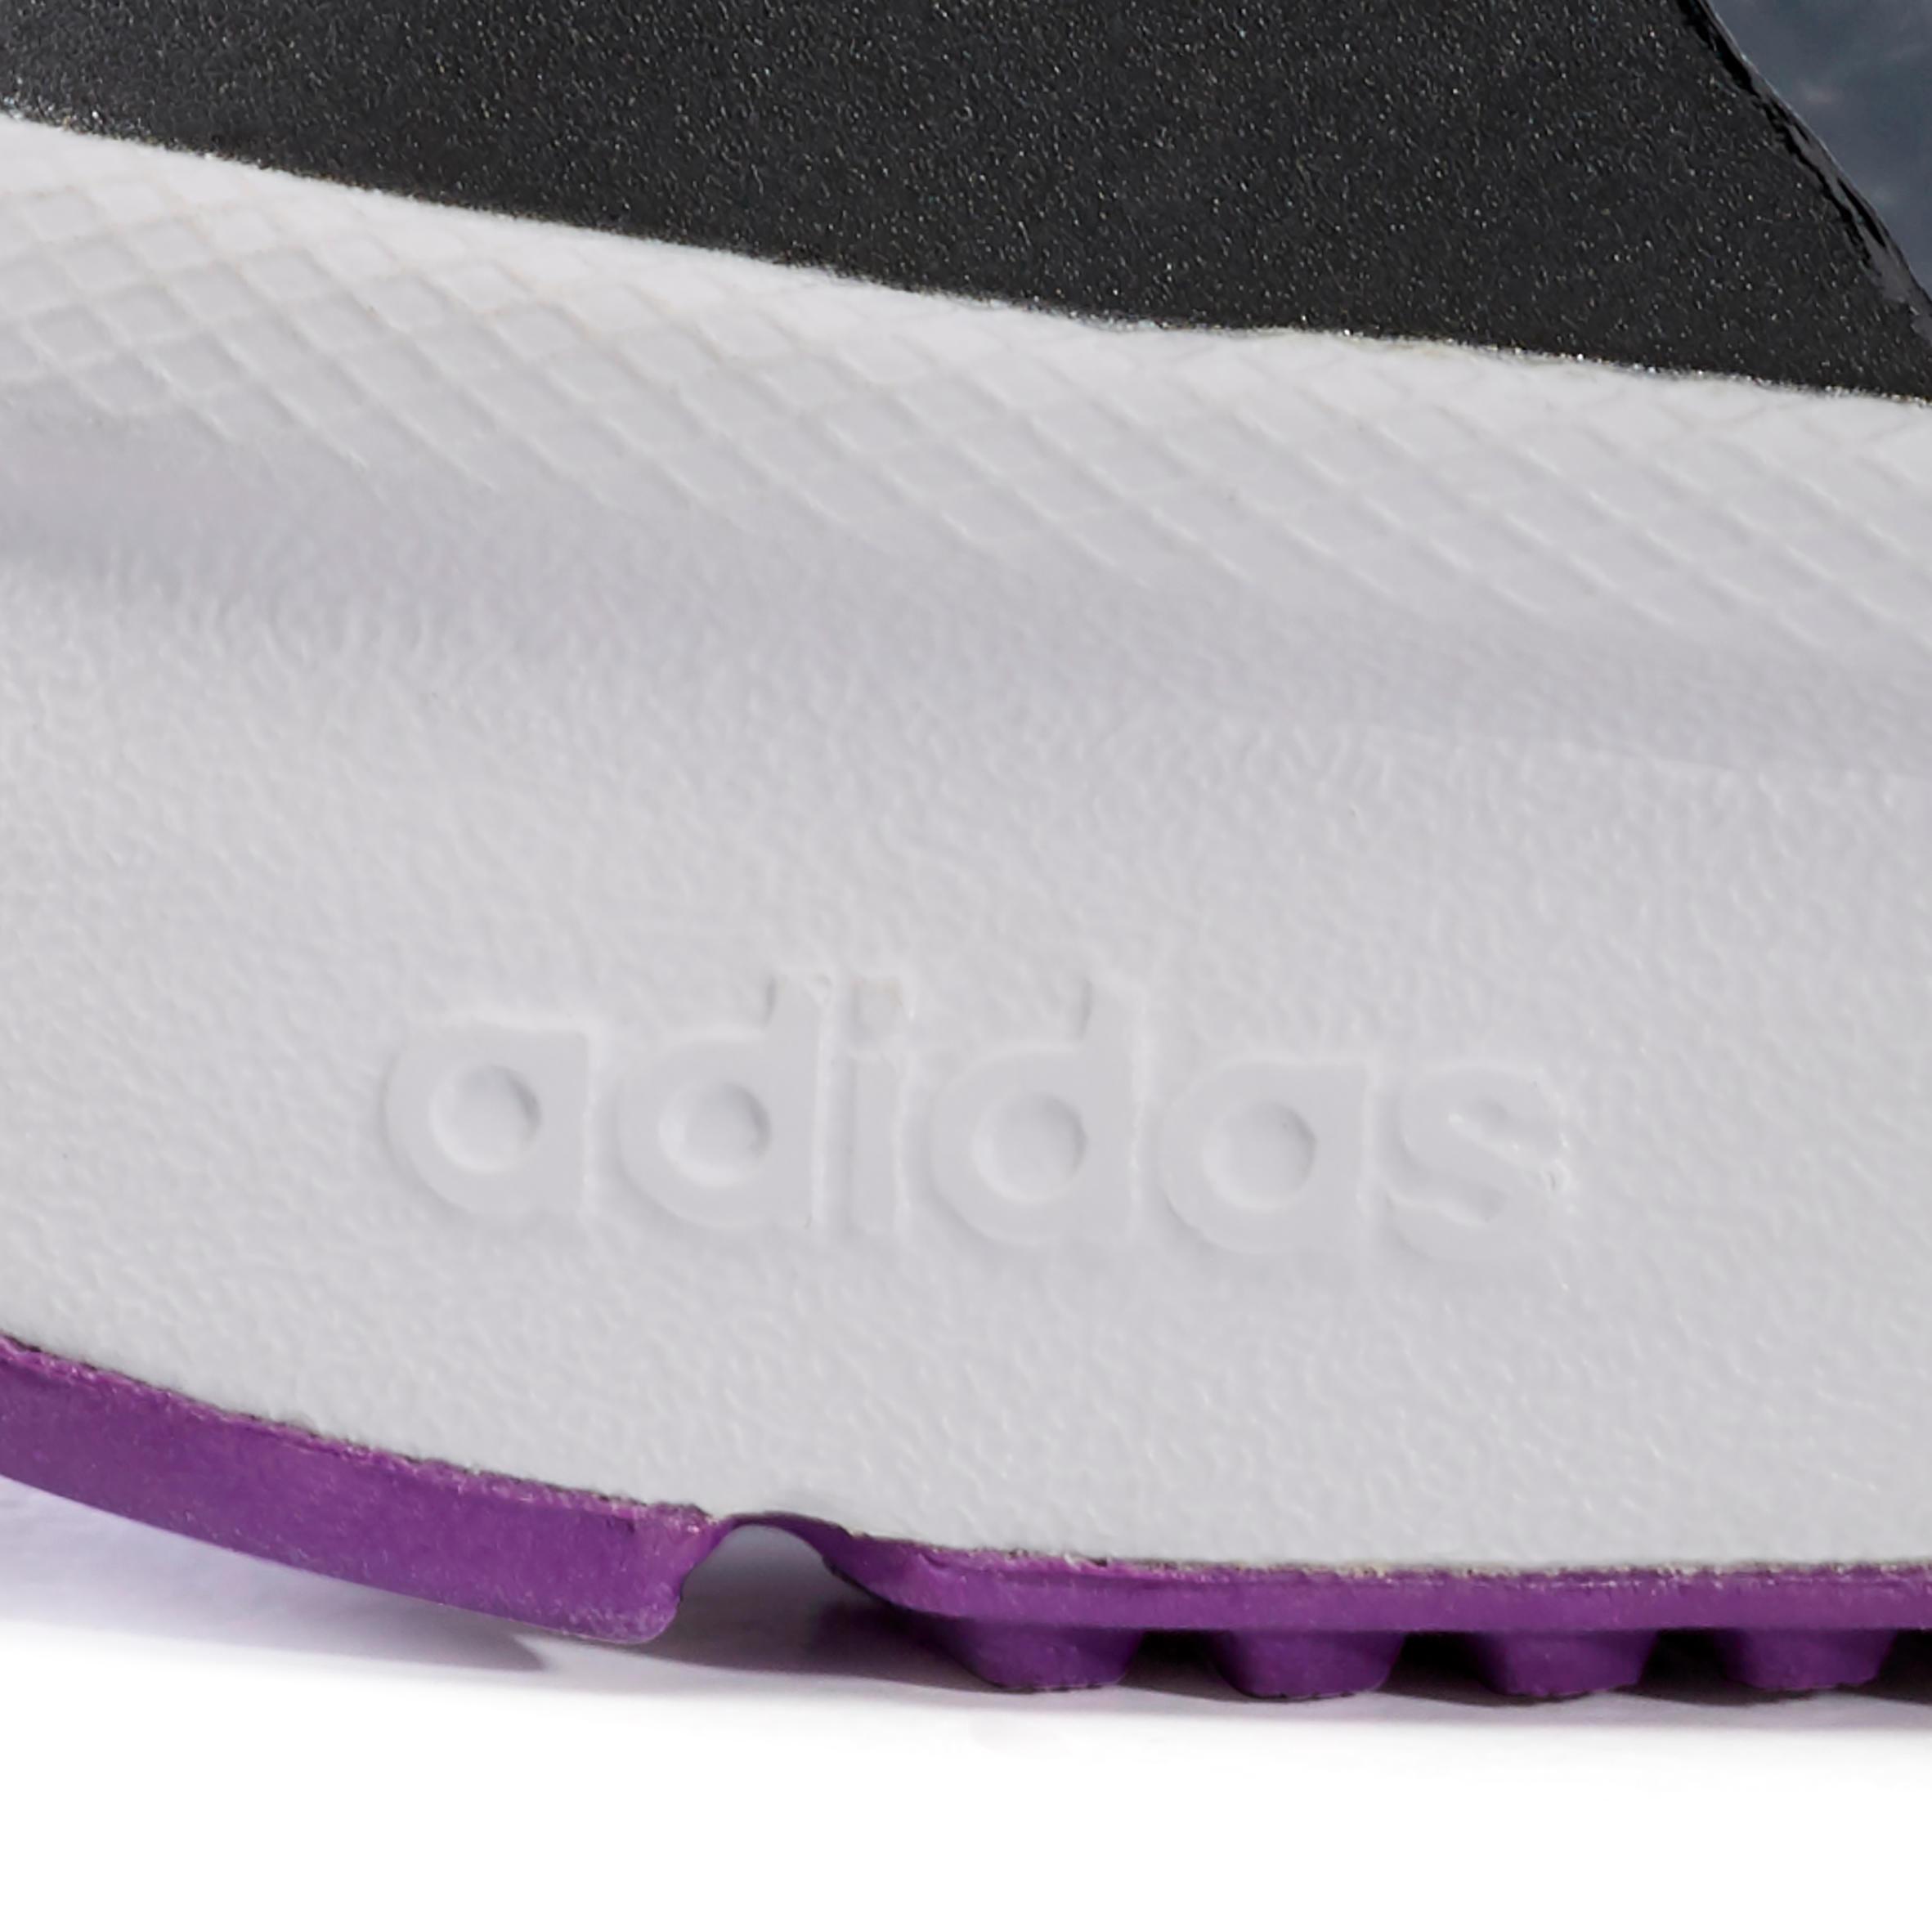 adidas scarpe donna camminata